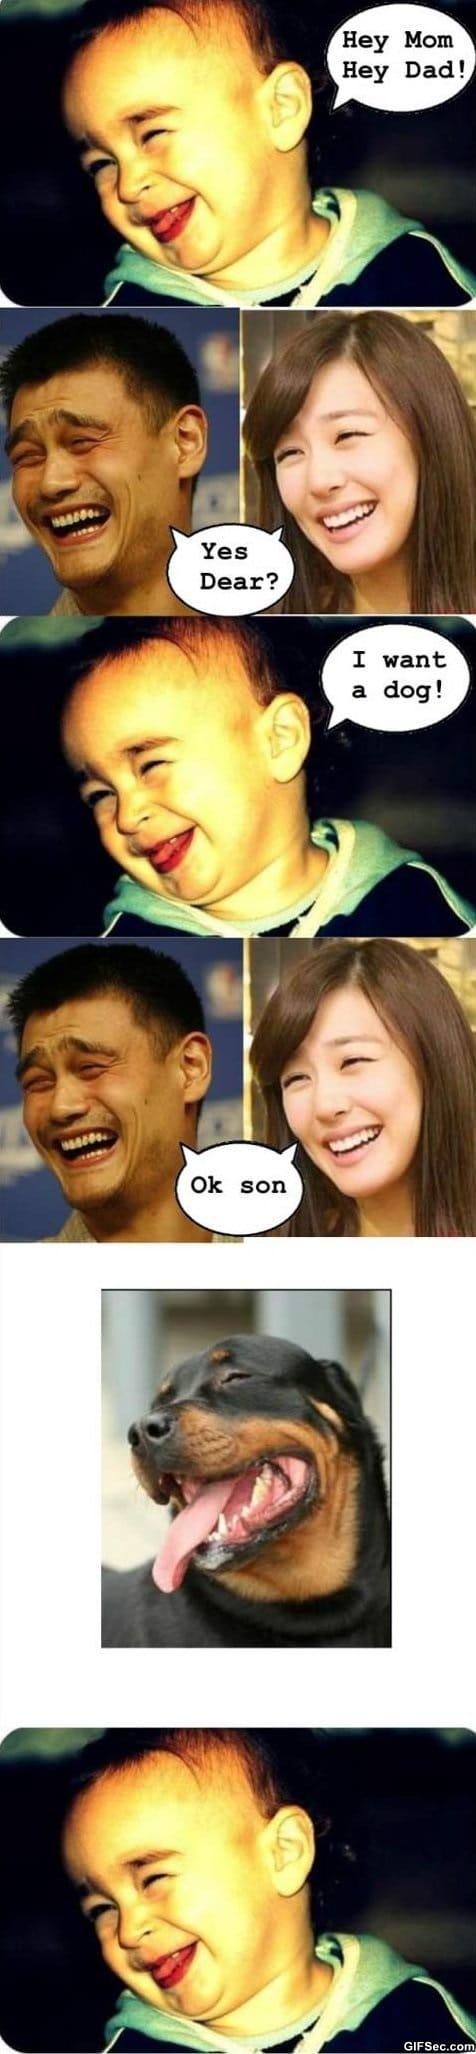 funny-yao-ming-meme